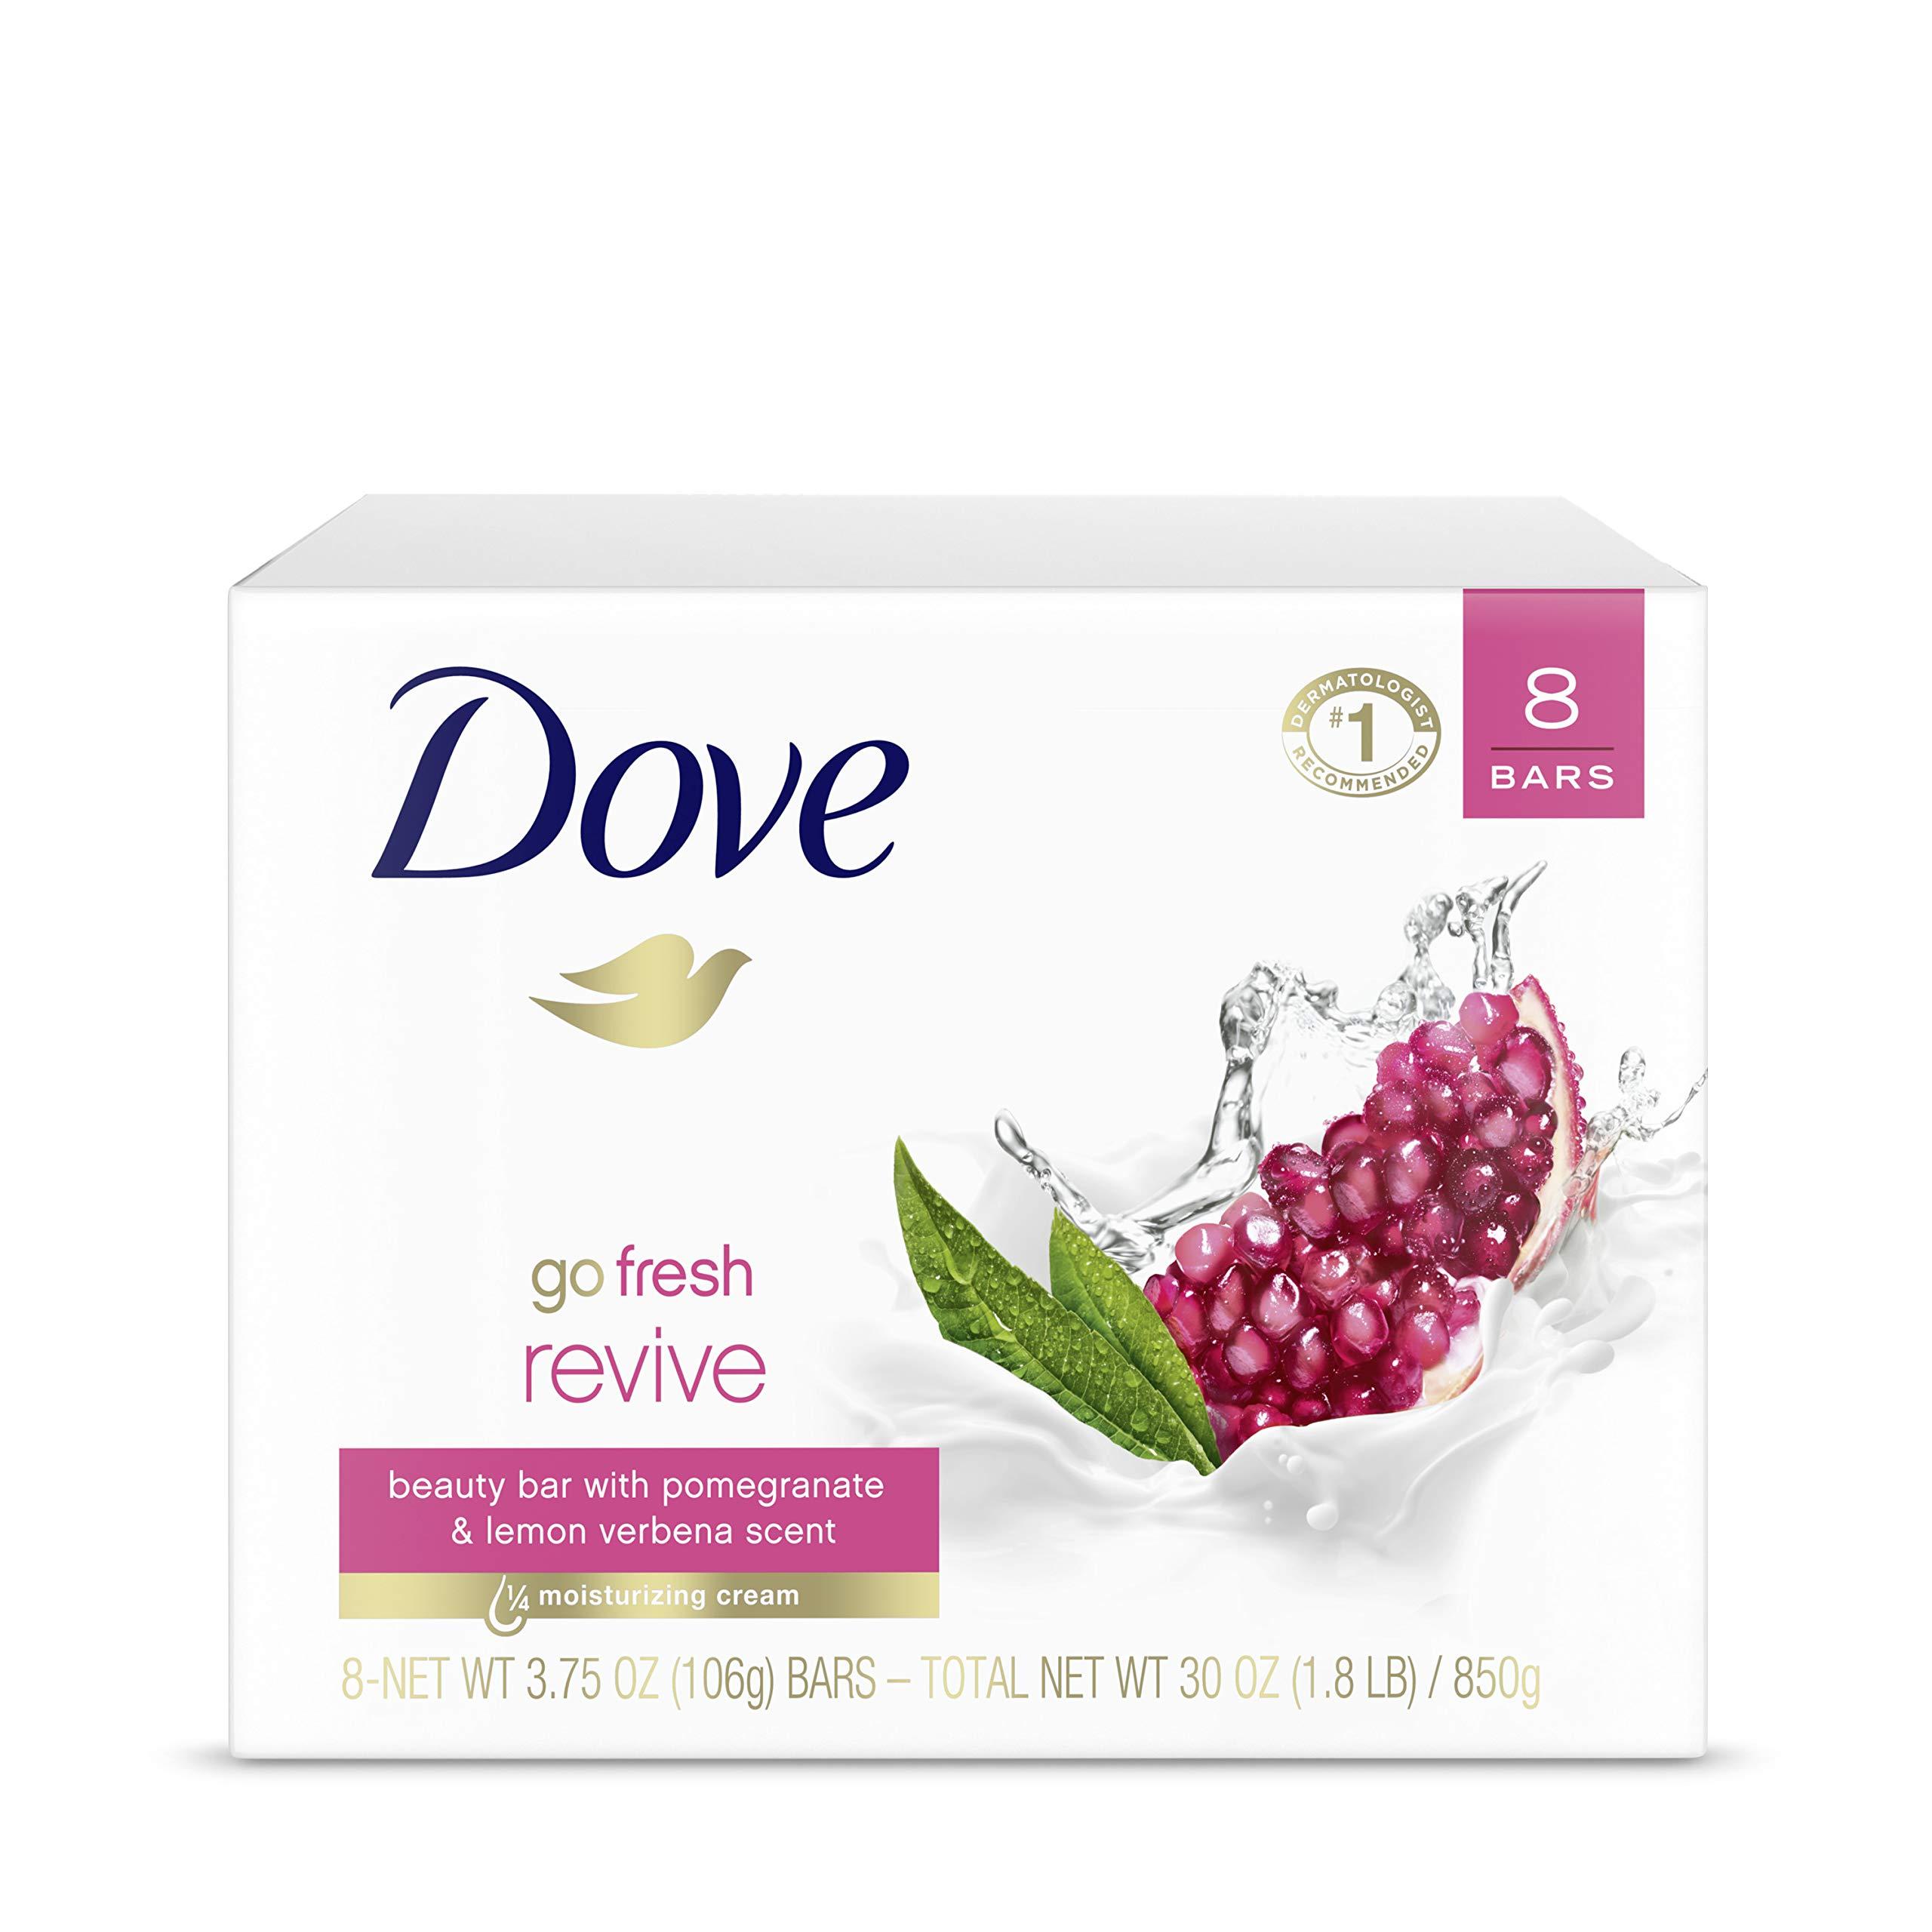 Dove go fresh Beauty Bar More Moisturizing Than Ordinary Bar Soap Revive Scented With Pomegranate and Lemon Verbena 3.75 oz 8 Bars